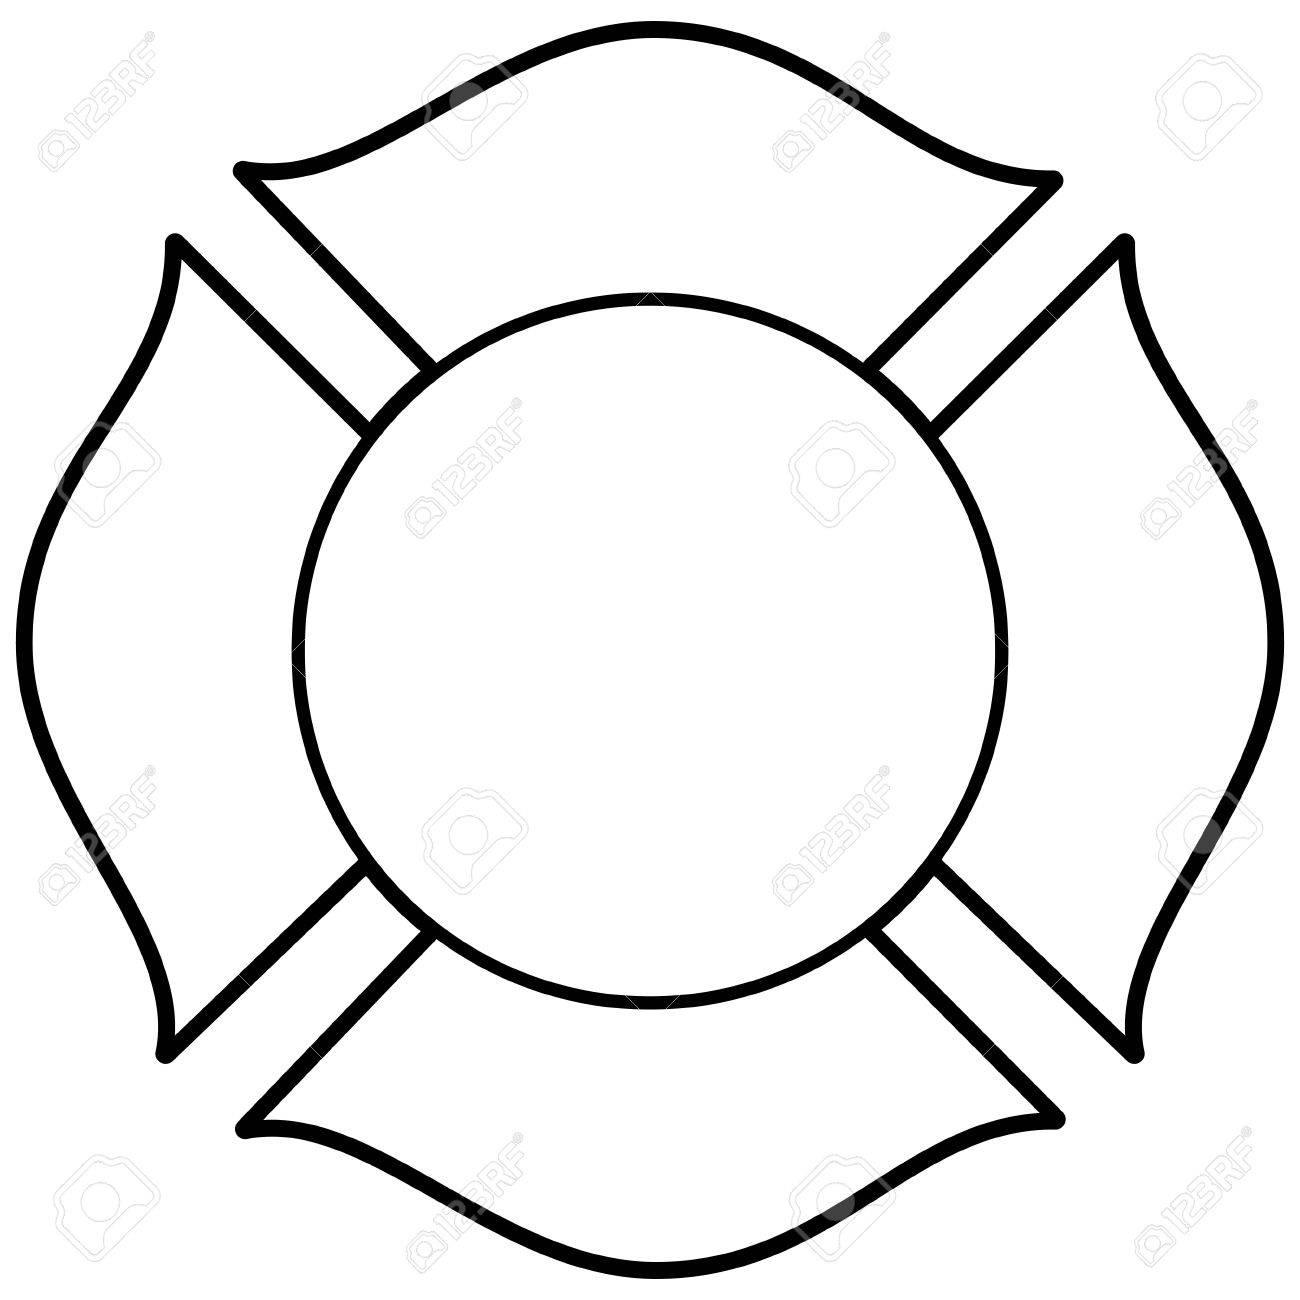 firefighter maltese cross illustration royalty free cliparts rh 123rf com maltese cross vector free maltese cross vector free